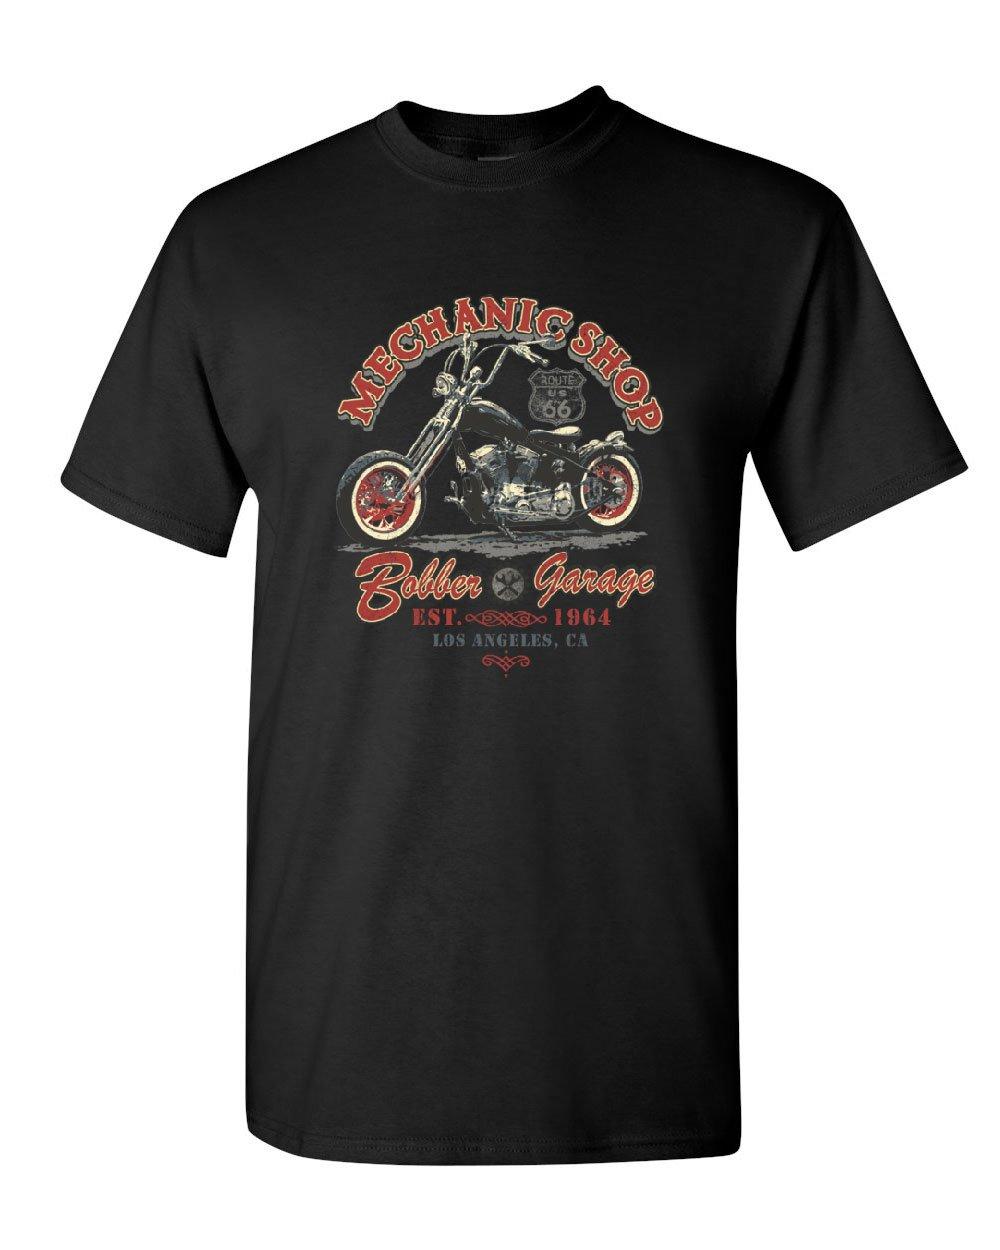 Body Shop T-shirt Motorcycle Garage Formula Champions Race Route 66 Tshirt